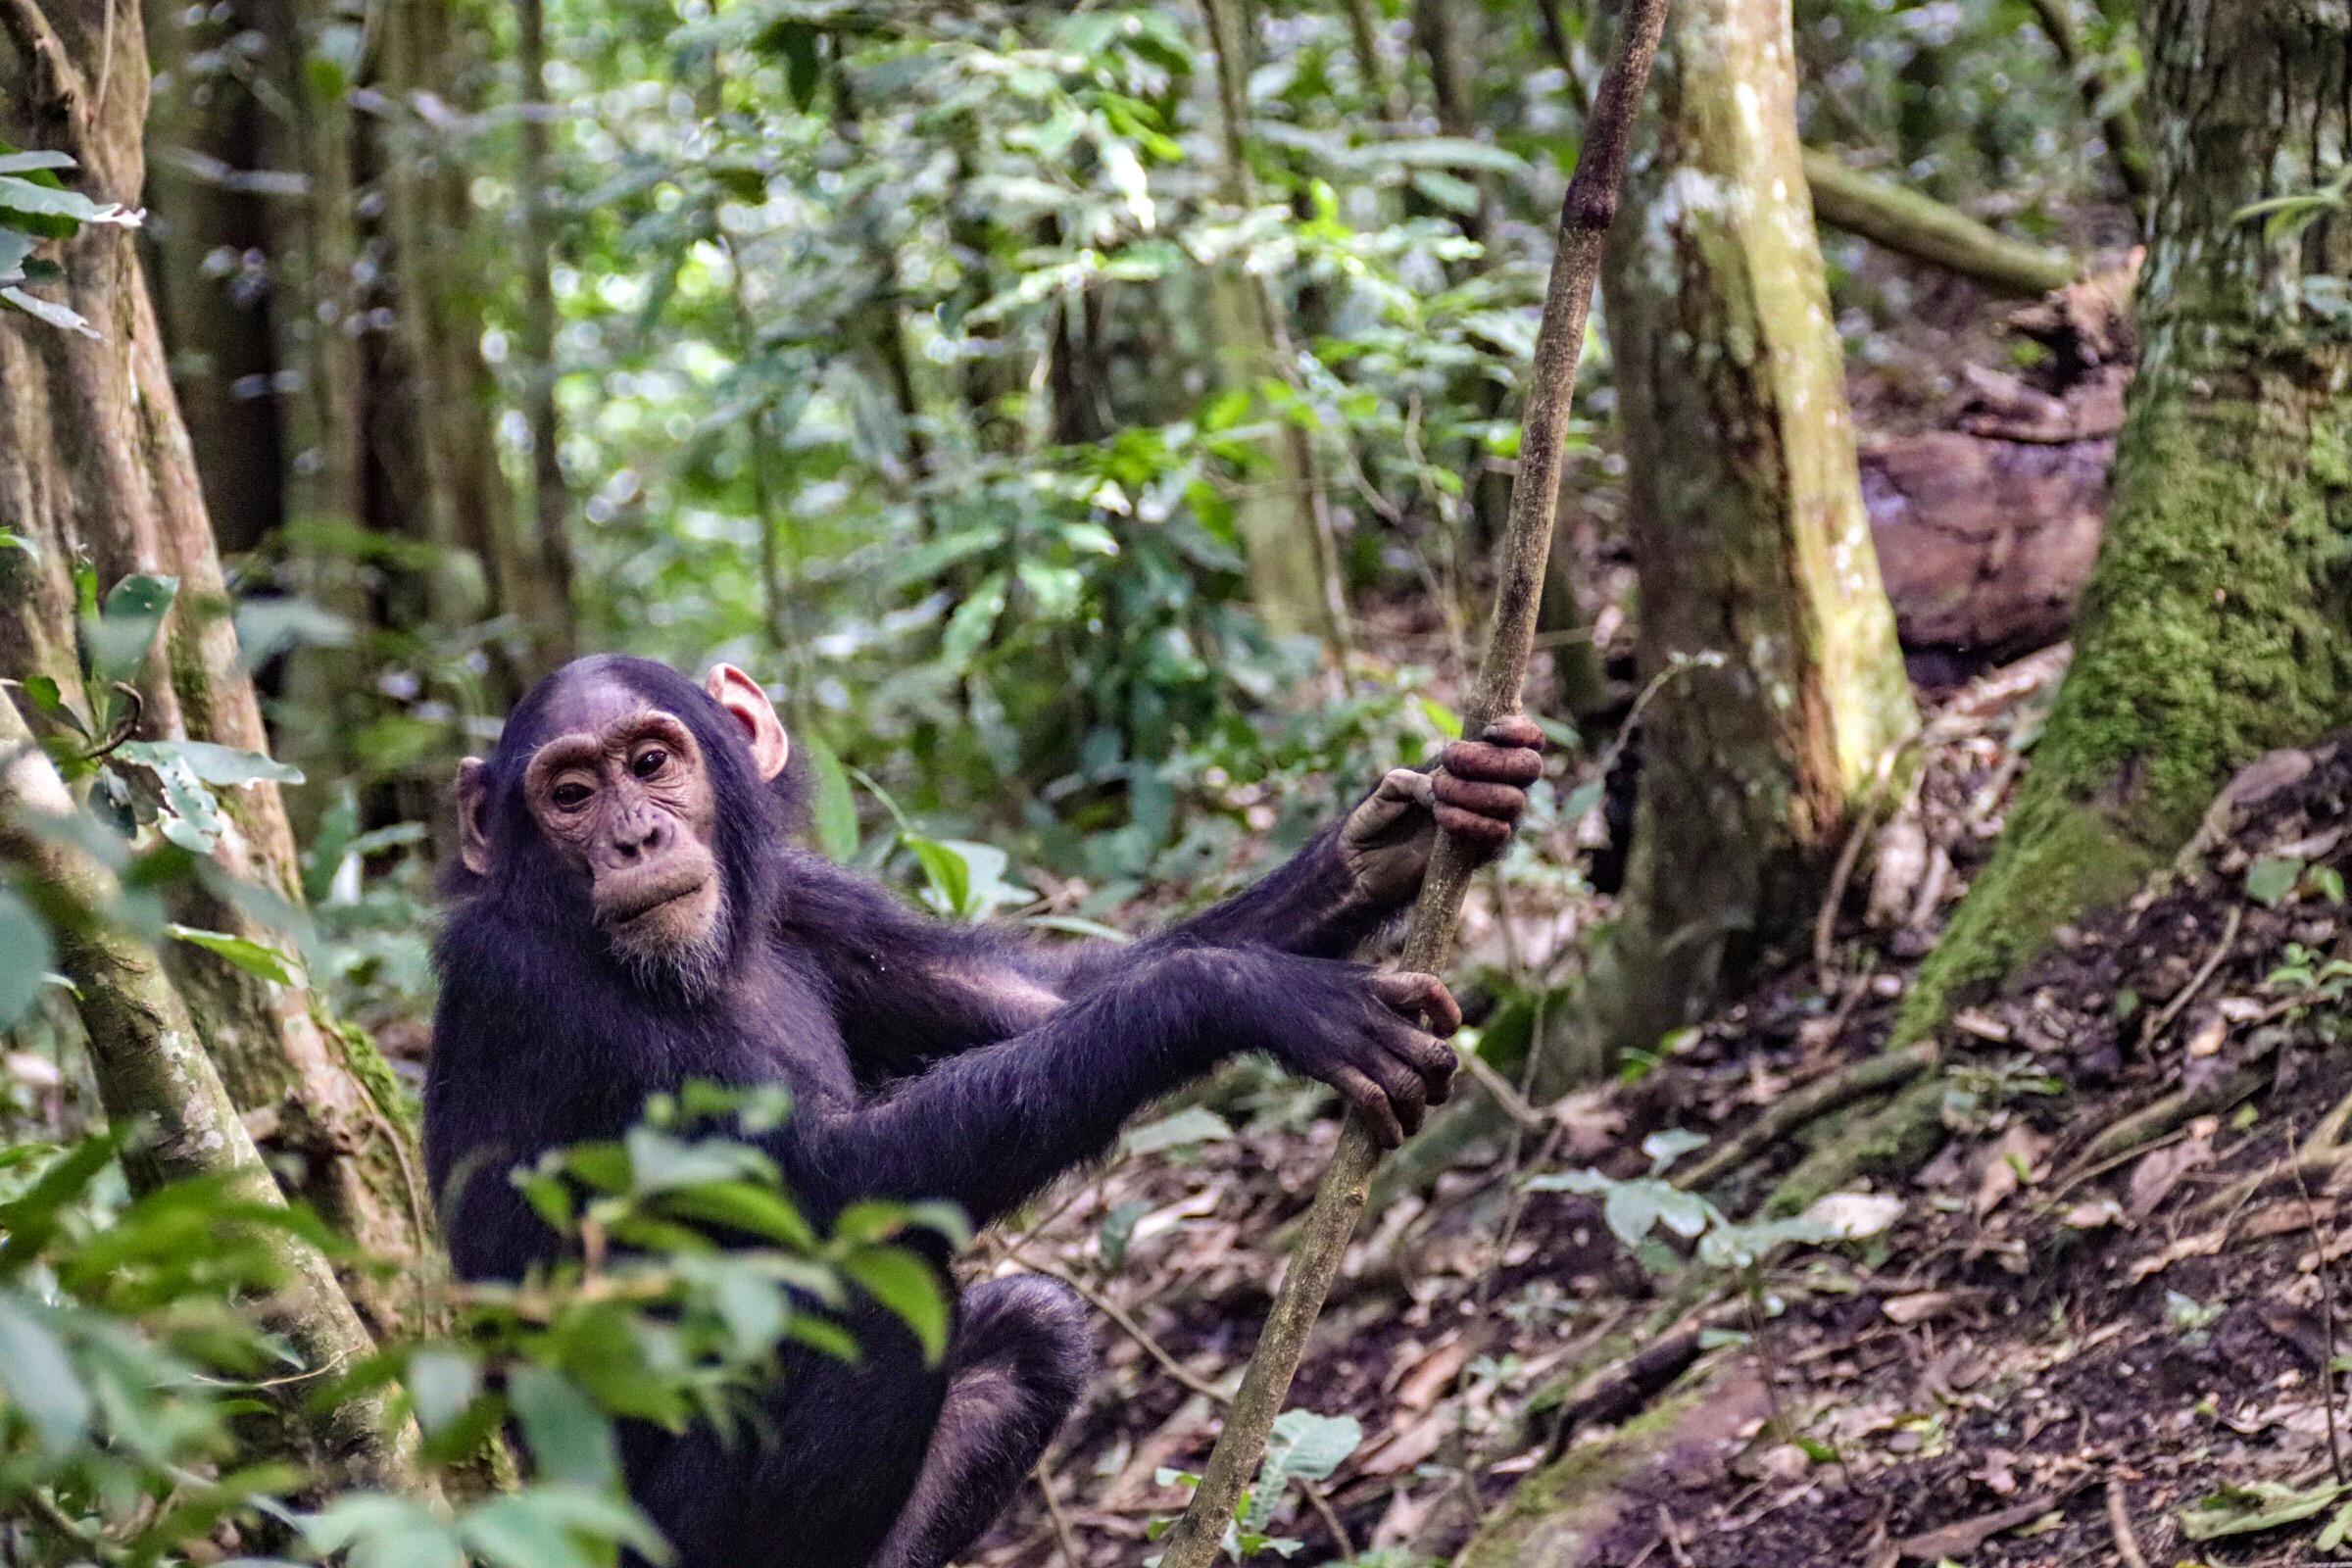 9-Day Safari Wildlife Tour Including Chimp, Gorilla Trekking 6